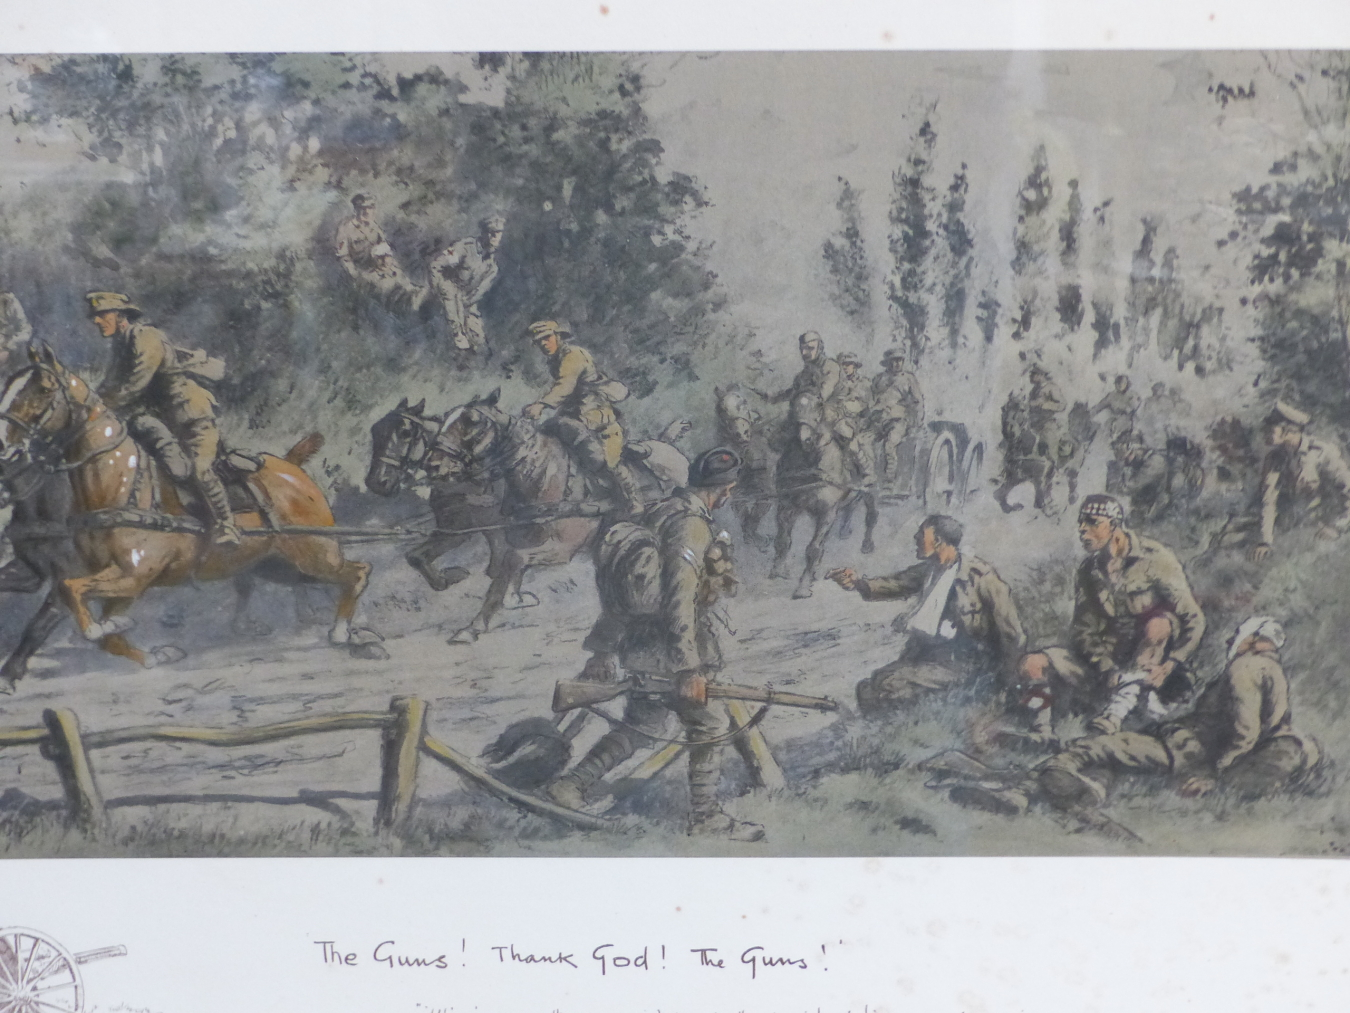 SNAFFLES, CHARLES JOHNSON PAYNE (1884-1967) THE GUNS, THANK GOD, THE GUNS!. COLOUR PRINT. 47 x